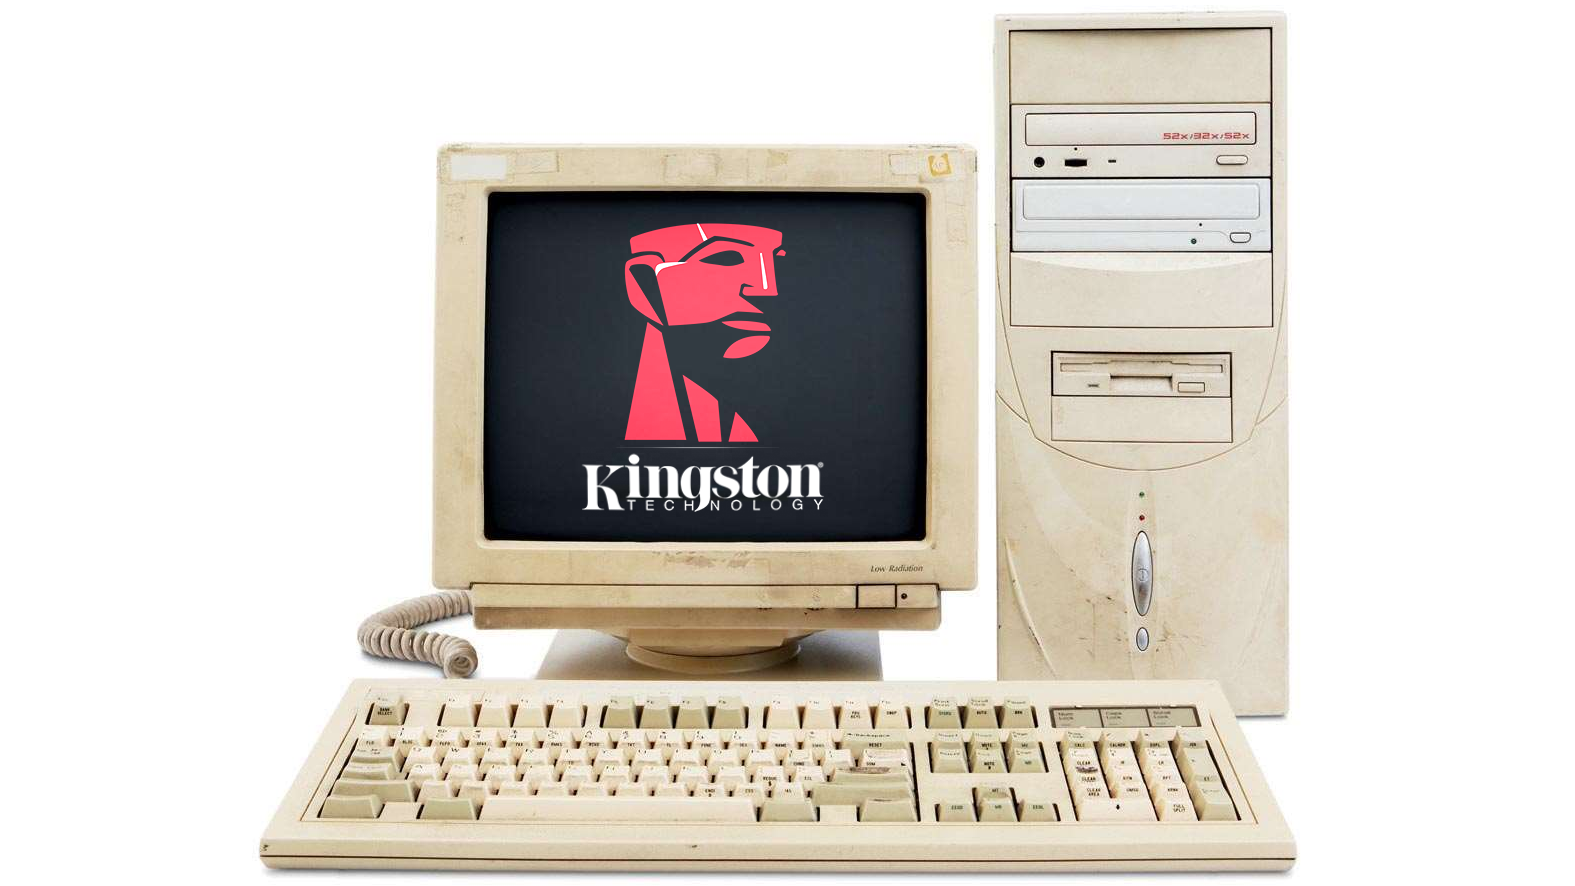 SSD Kingston UV500 - King of upgrades